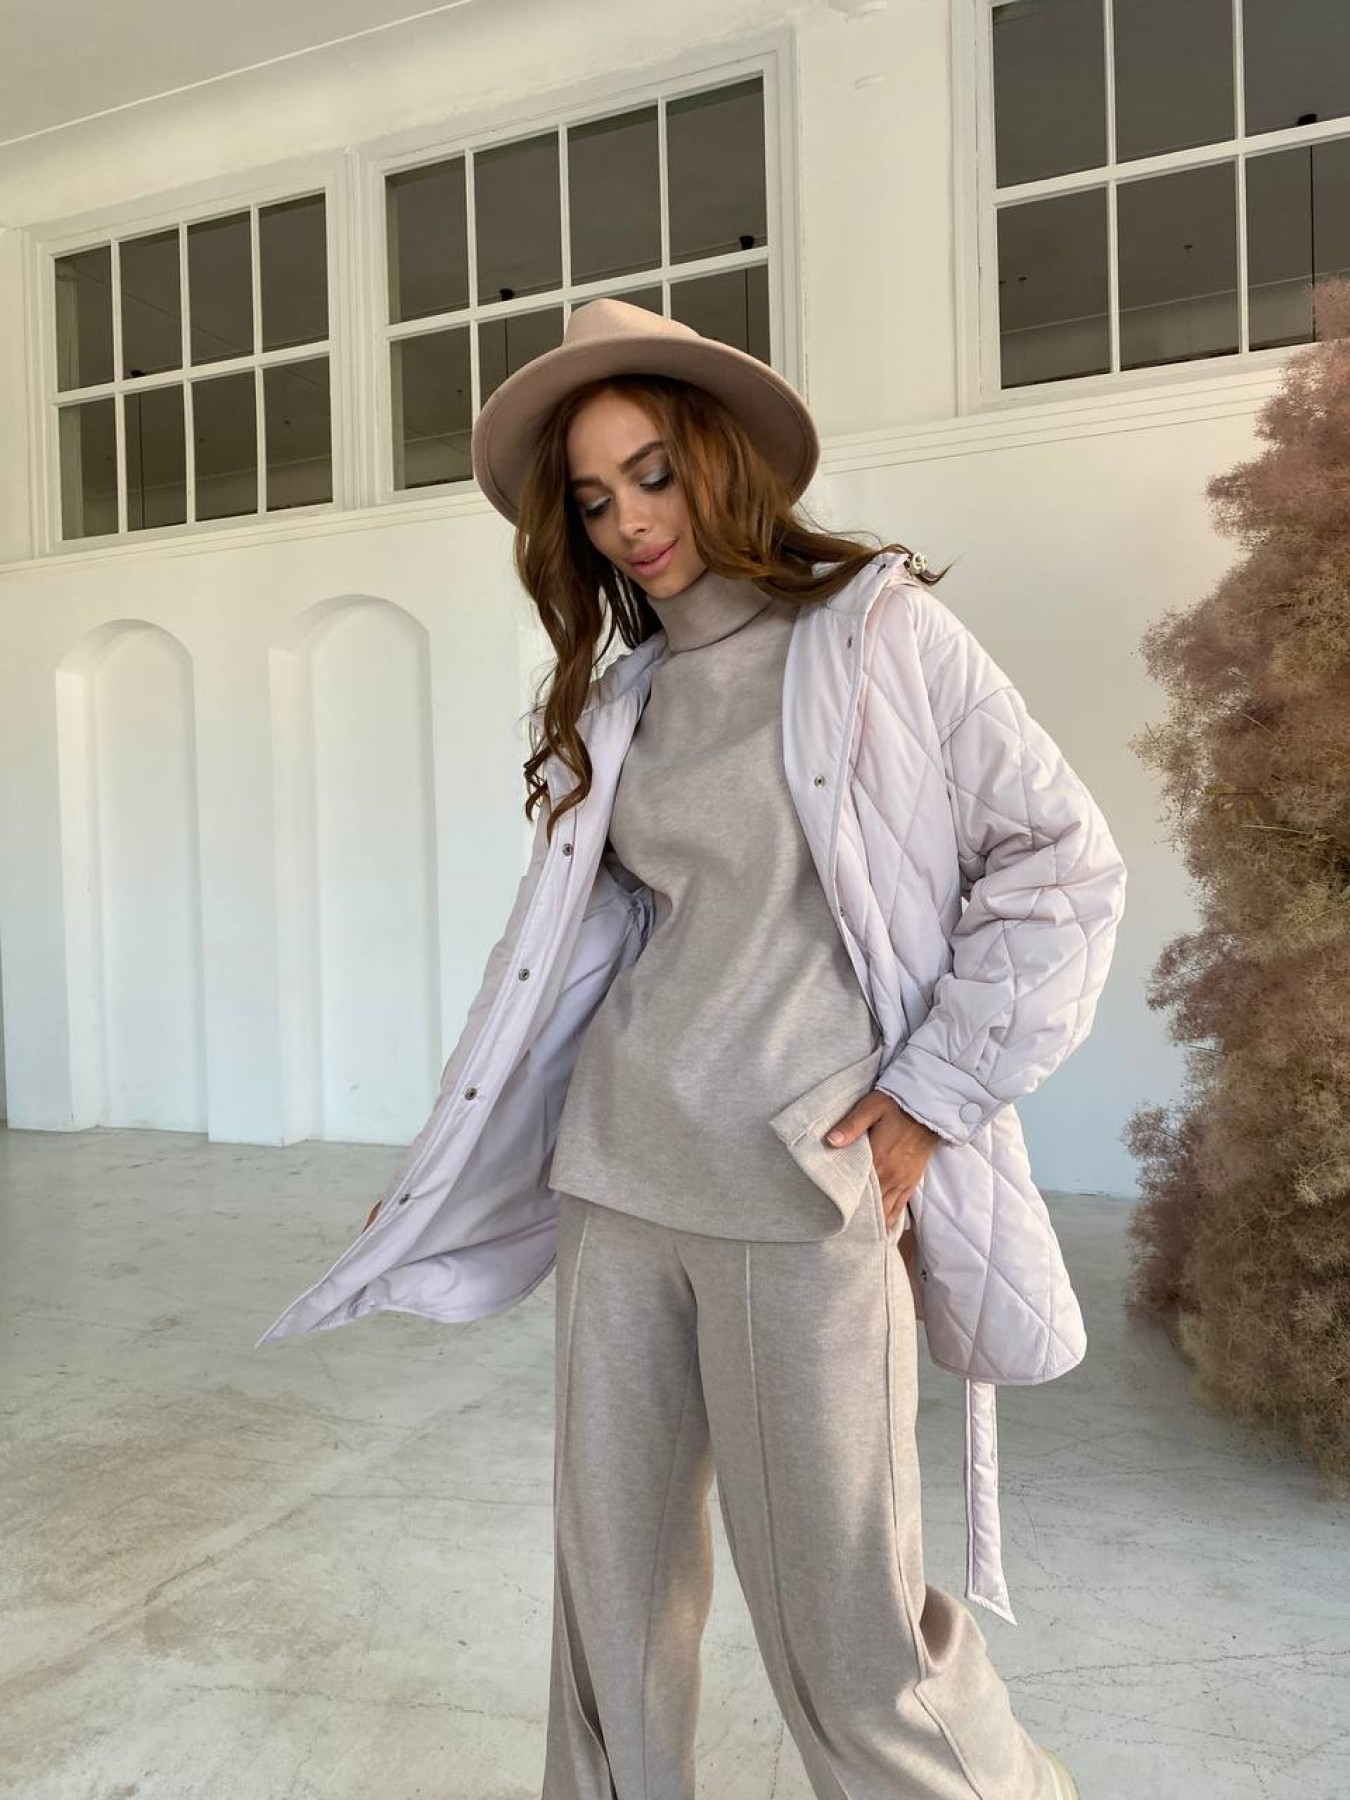 Пазл стеганая куртка из плащевки 10890 АРТ. 47355 Цвет: Бежевый 970 - фото 5, интернет магазин tm-modus.ru